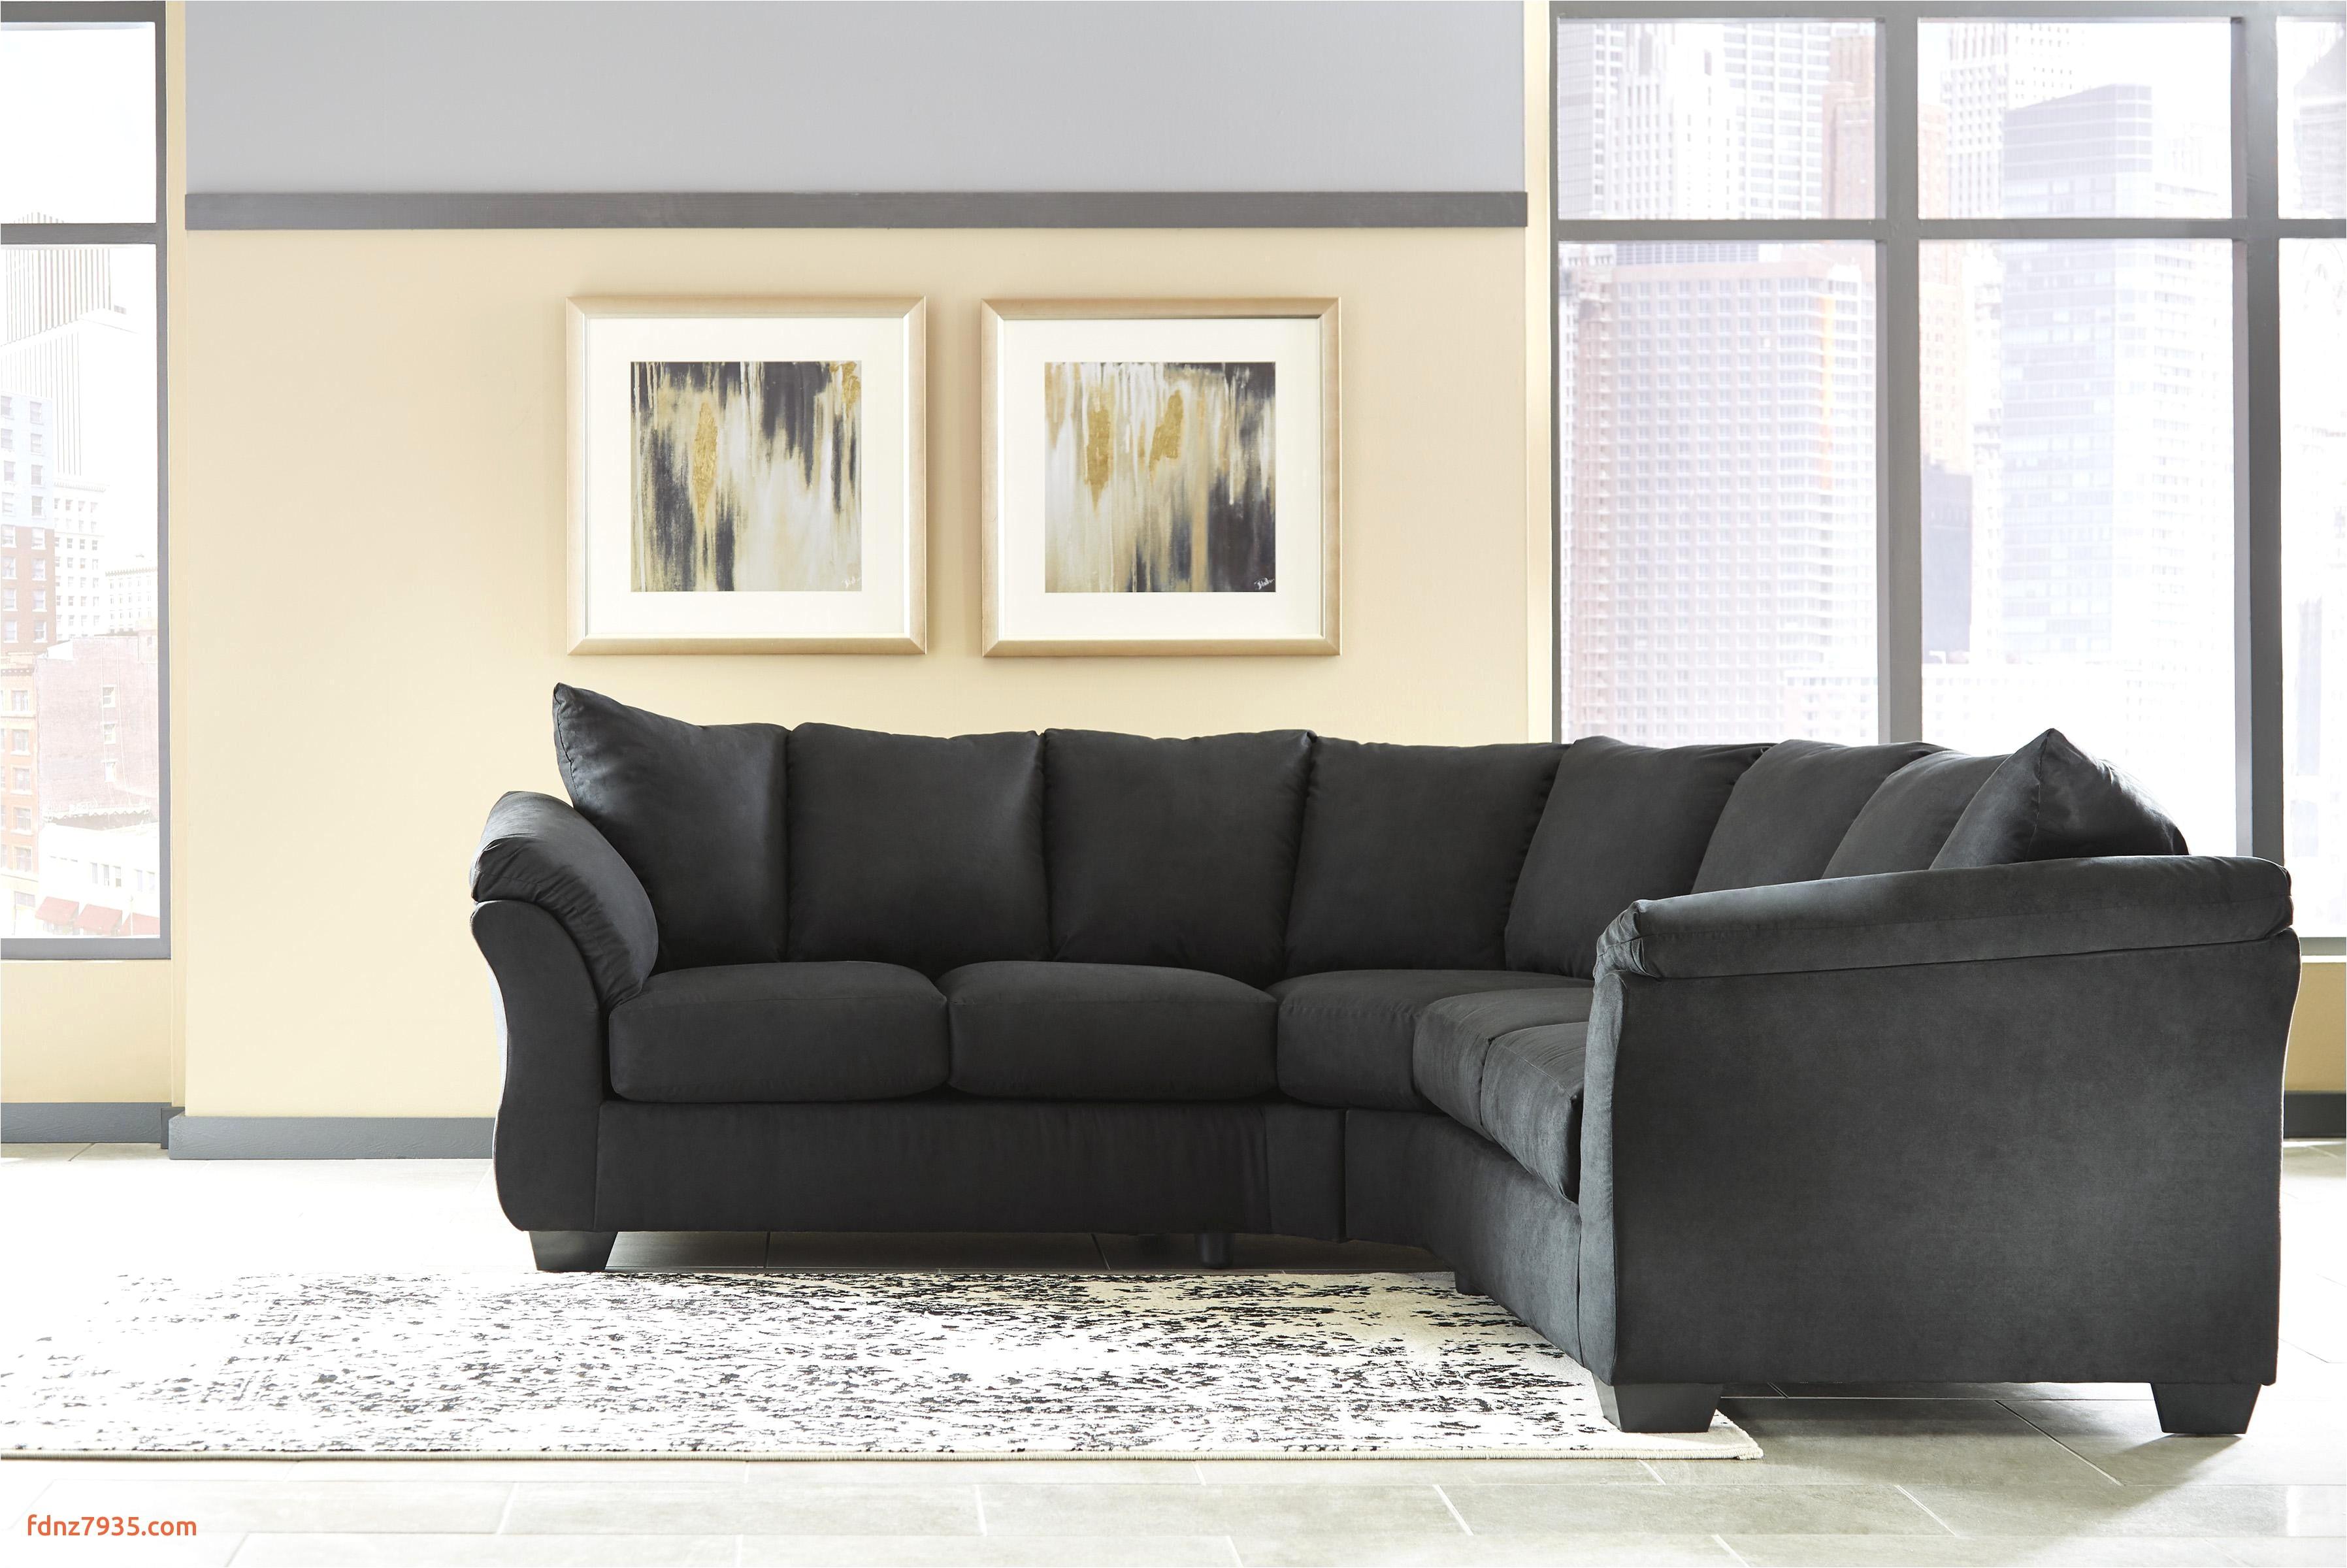 Italian Sectional sofas Fabric Italian Sectional sofa Fresh sofa Design